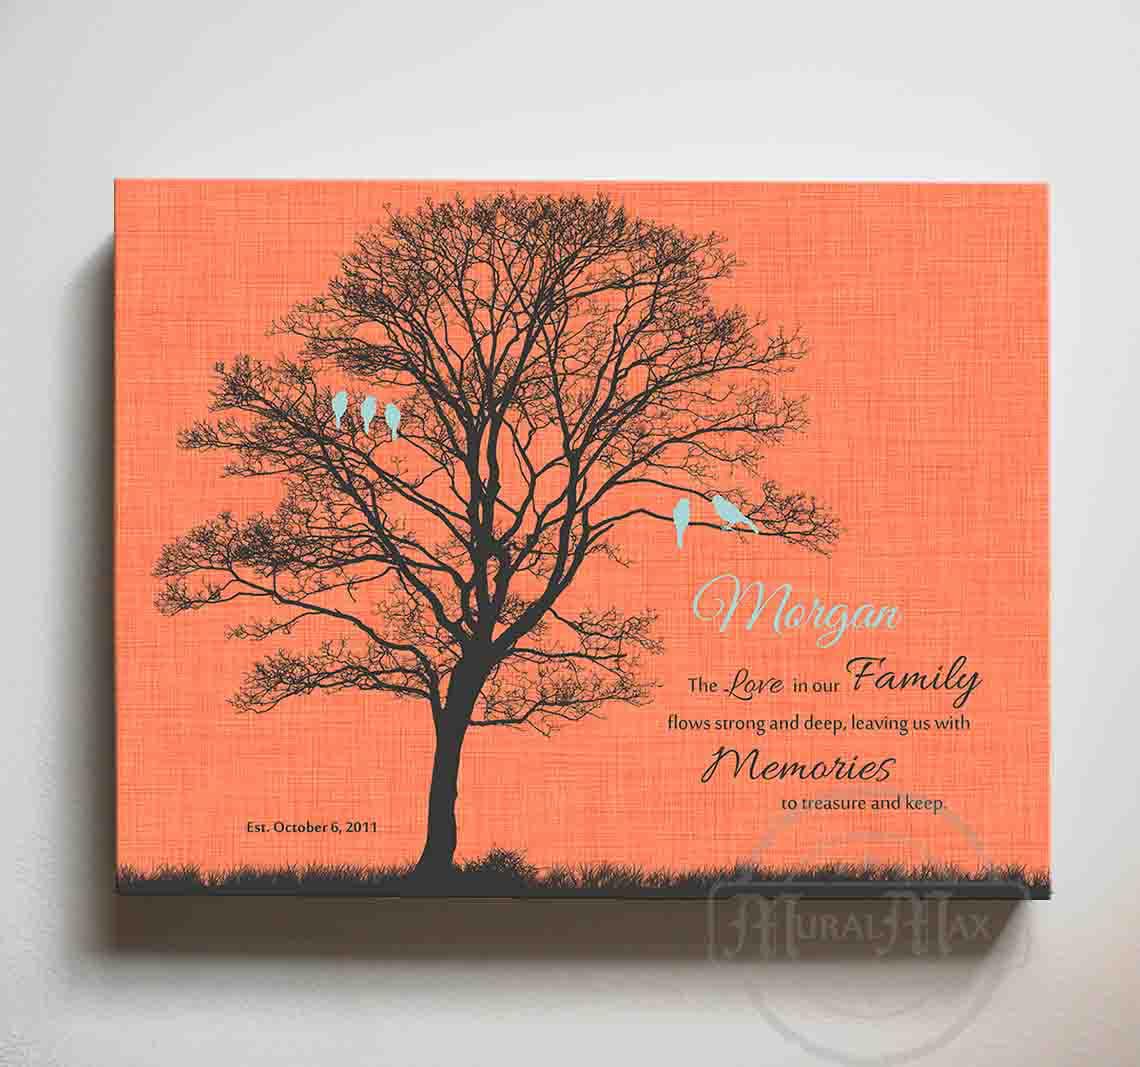 MuralMax Personalized Canvas Family Tree - Memories To Treasure  Inspirational Quote, His & Hers Anniversary Wall Decor - Romantic Gifts For  Milestone ...